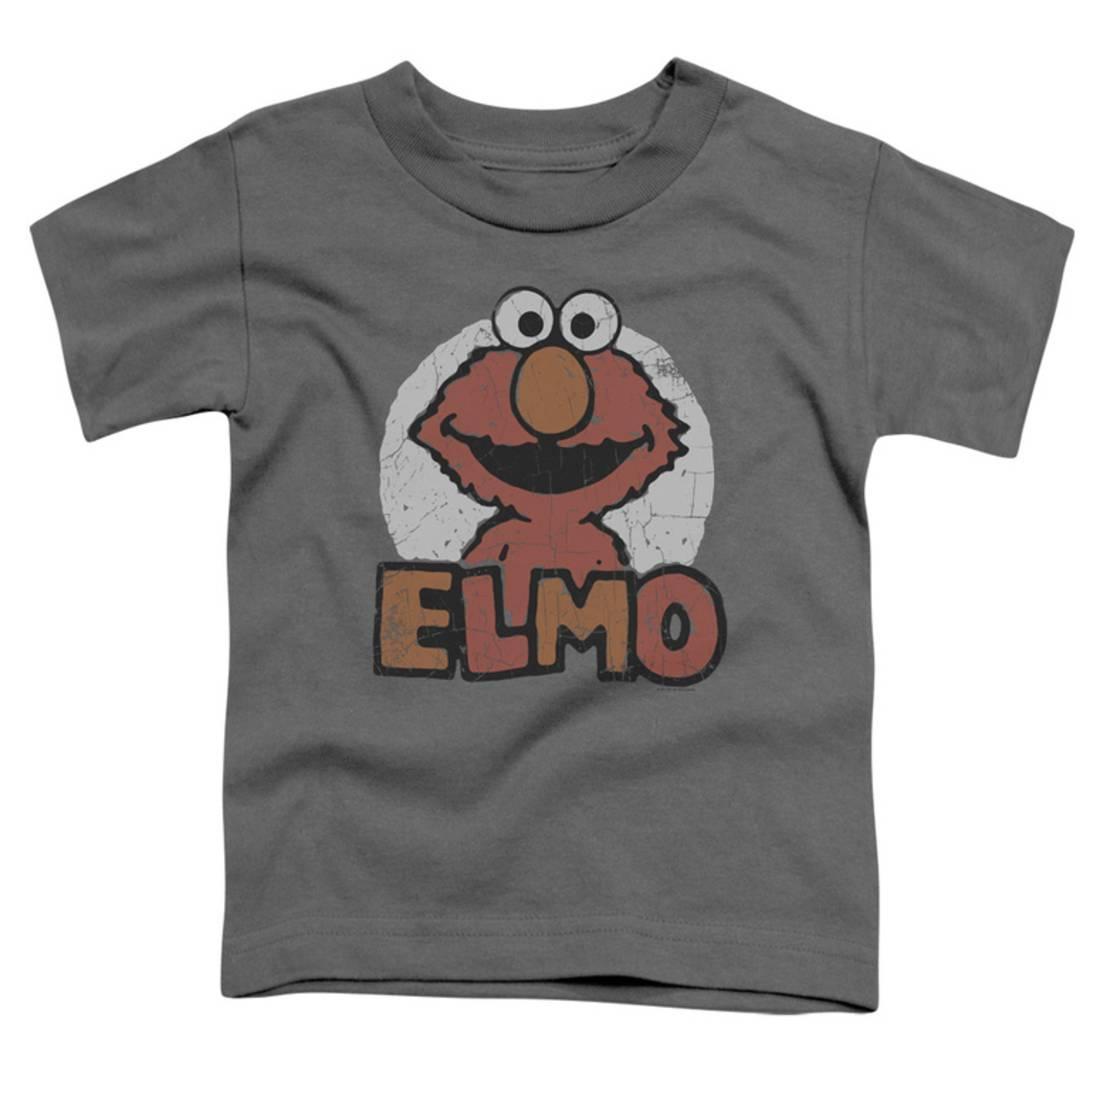 Toddler: Sesame Street- Elmo Patch Apparel Baby T-Shirt - Grey